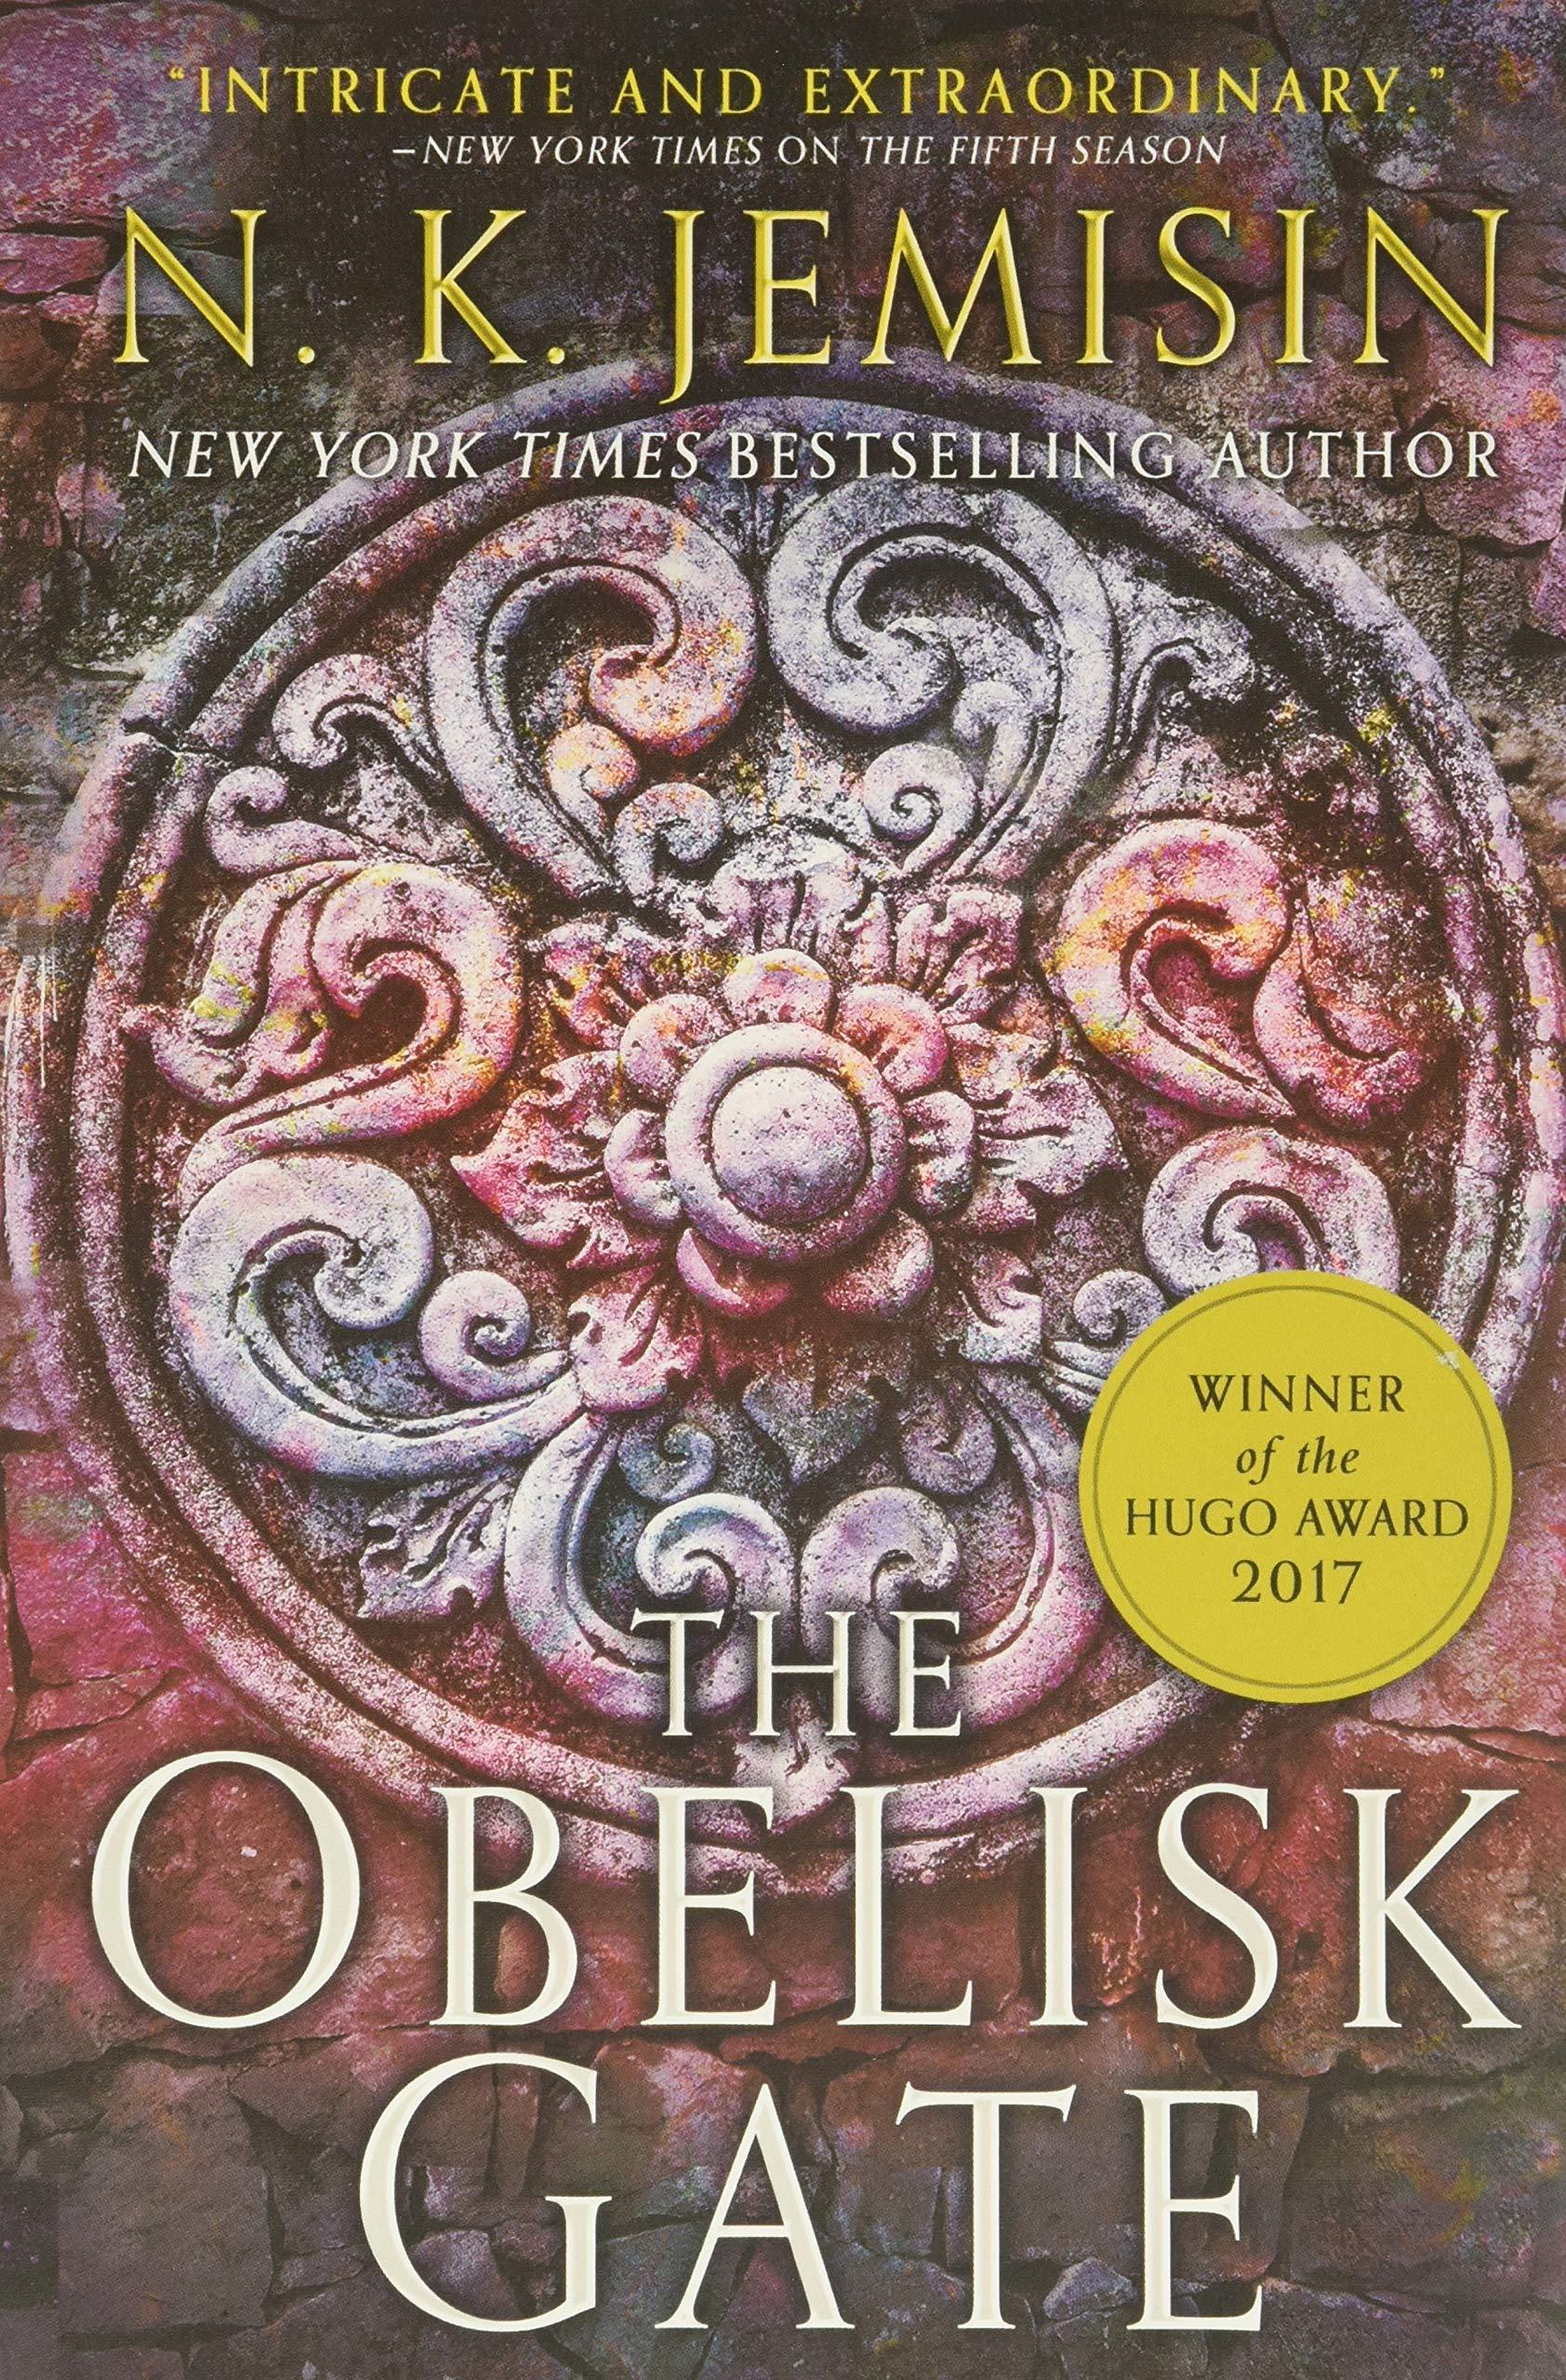 Download The Obelisk Gate The Broken Earth 2 By Nk Jemisin